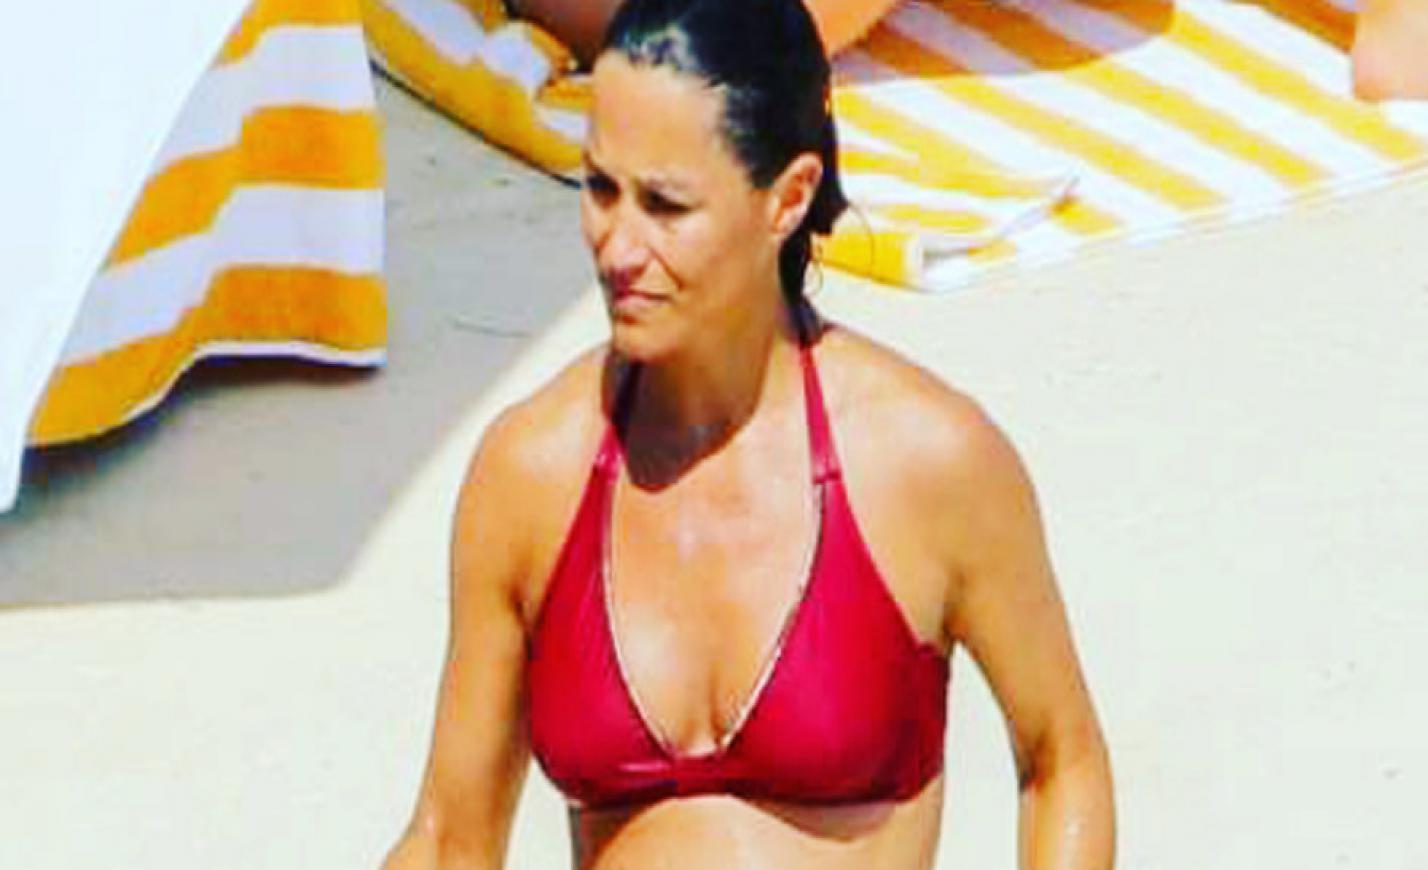 Bikiniben mutatta meg magát a terhes Pippa Middleton